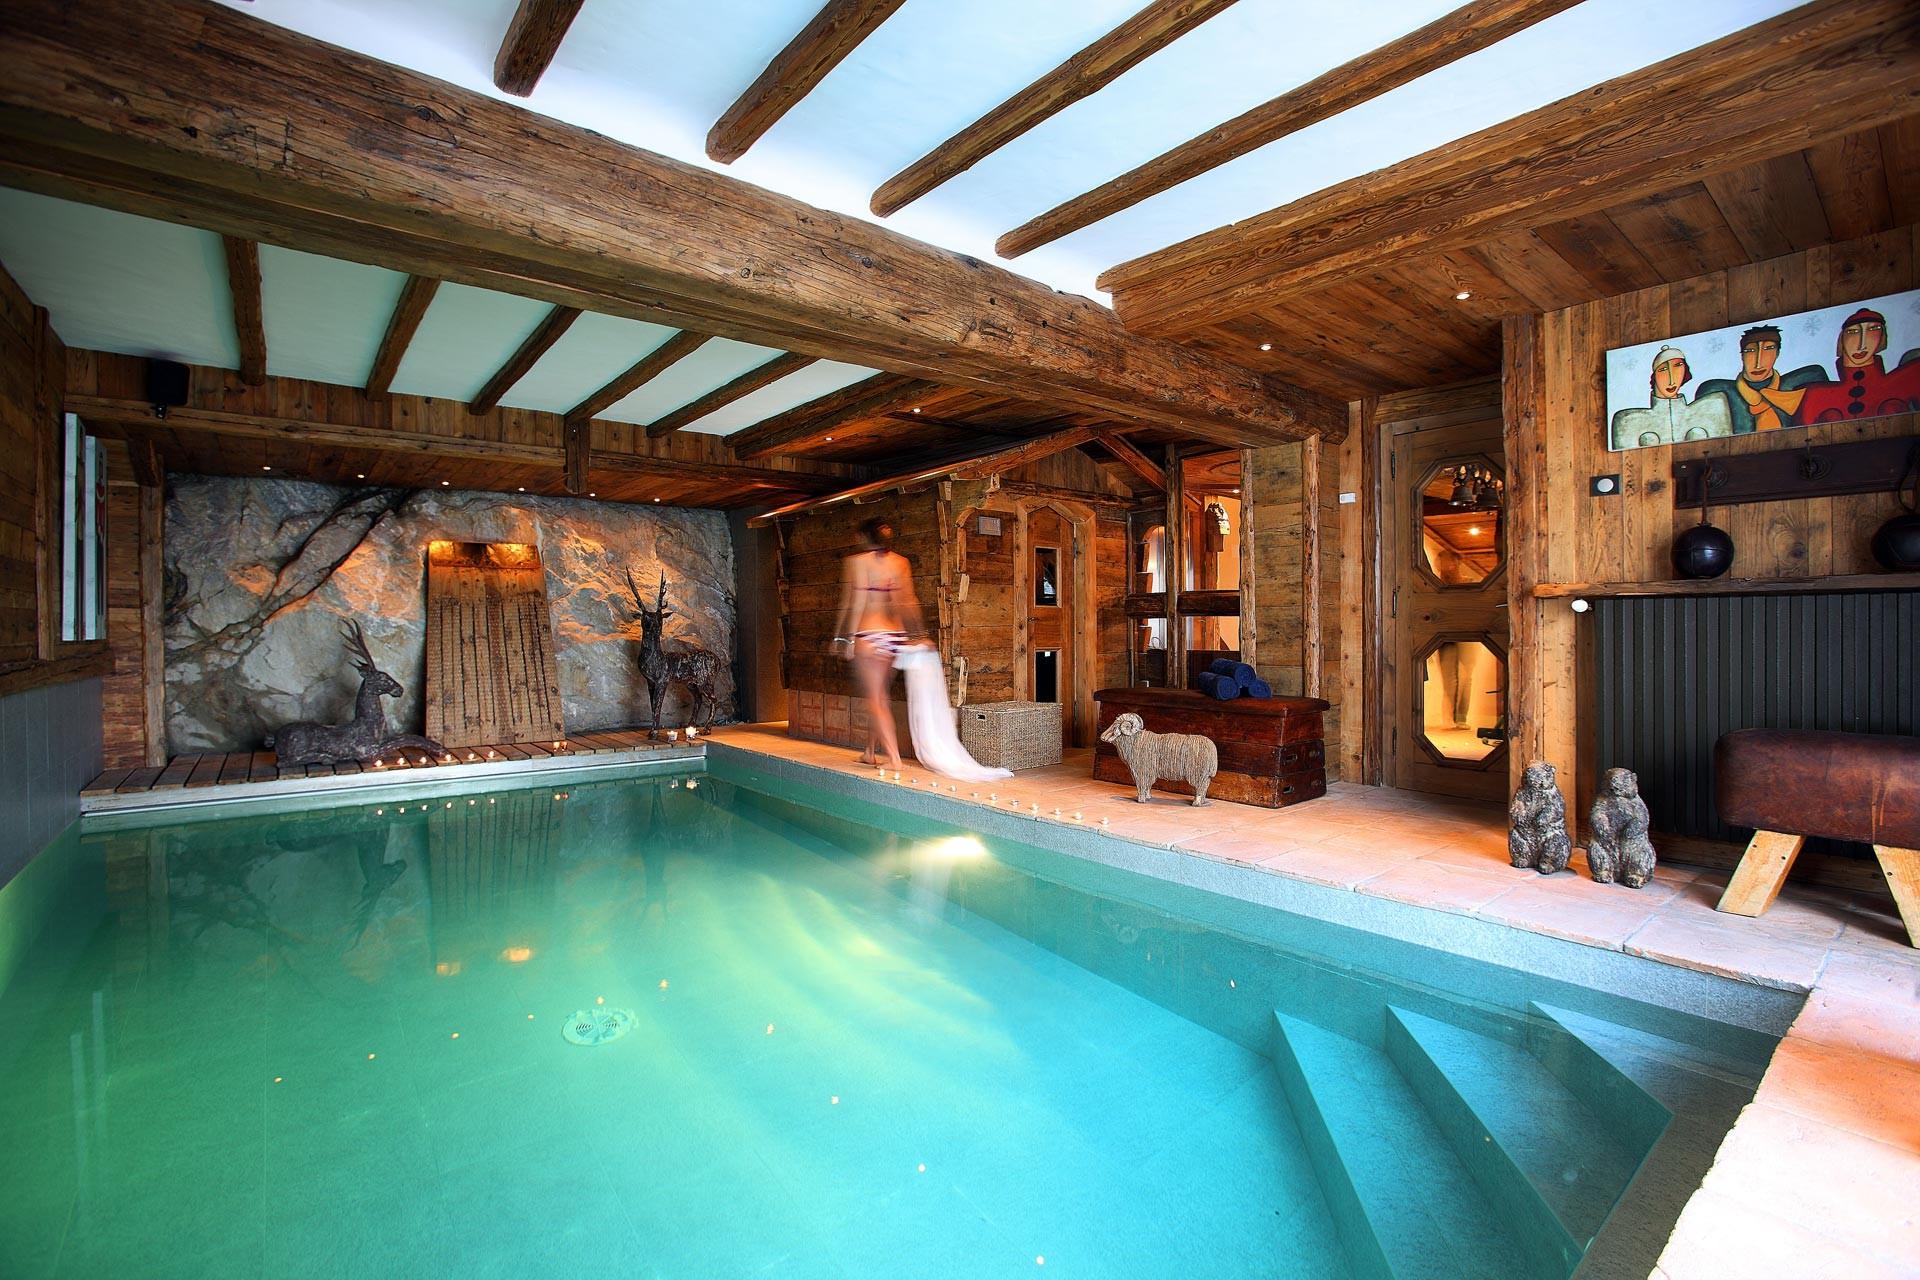 piscine-rocher-2-aec-collection-3